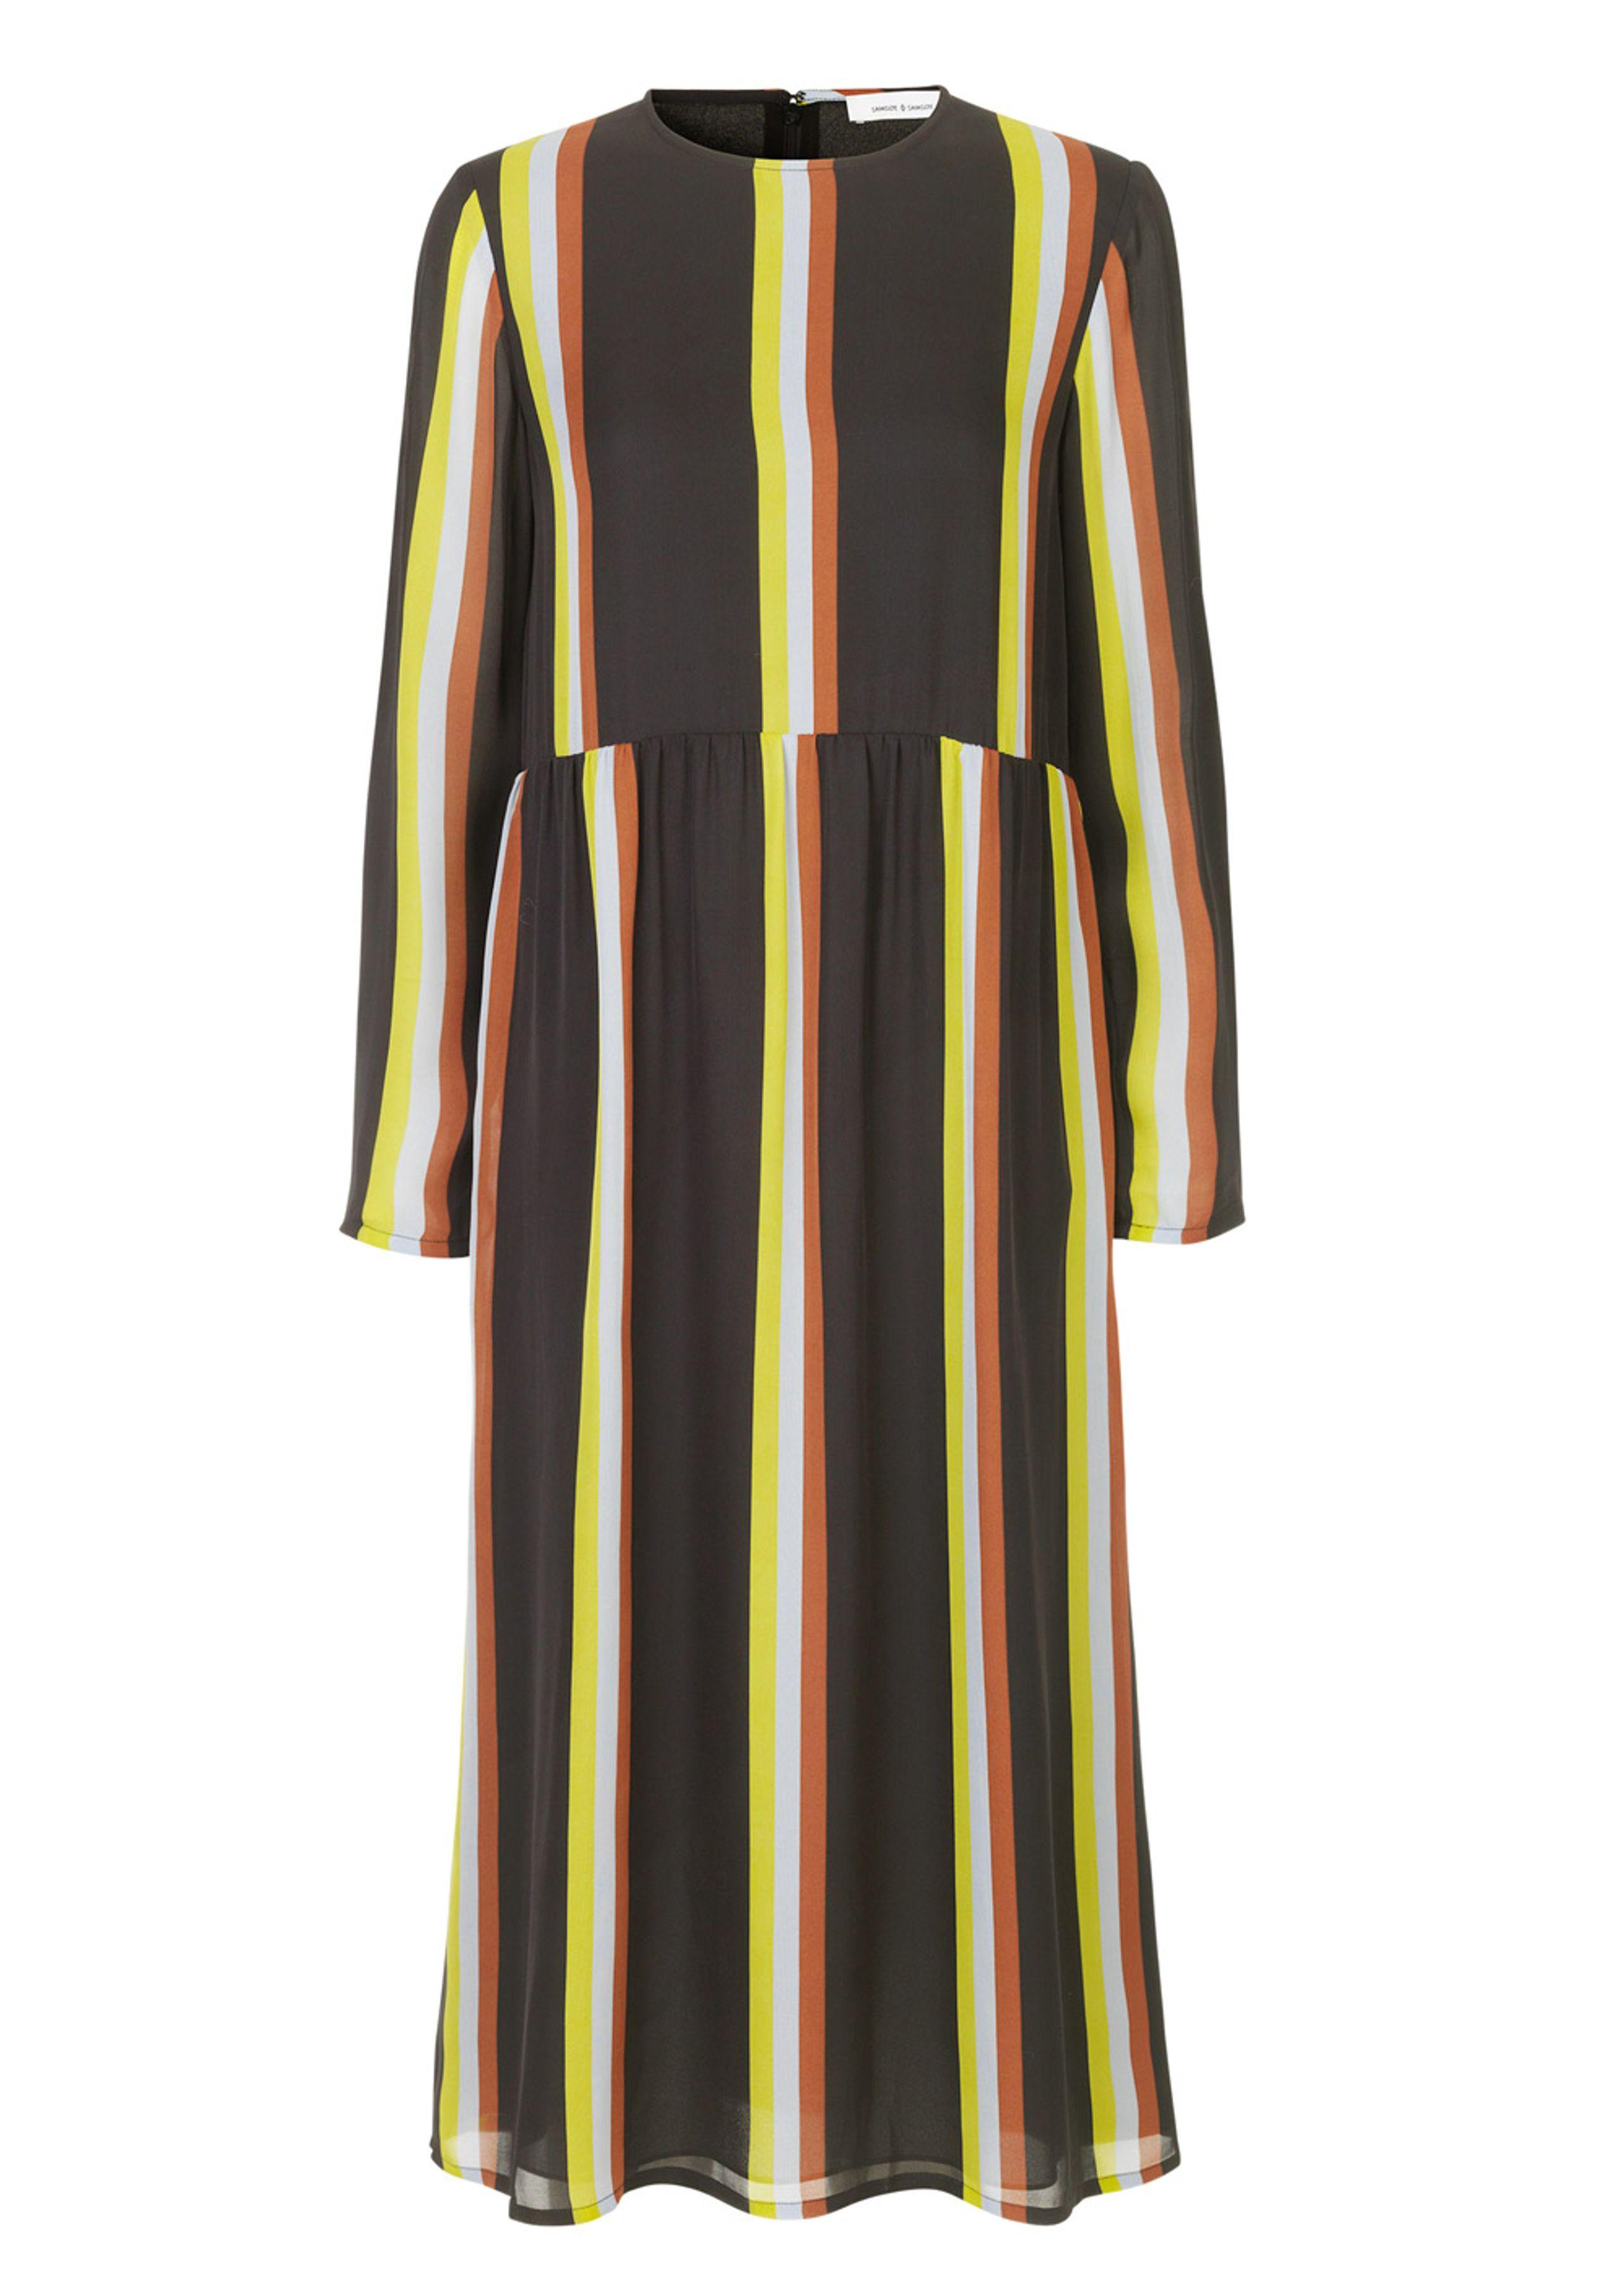 a6a78895f Raven Dress - Dress - Samsøe & Samsøe